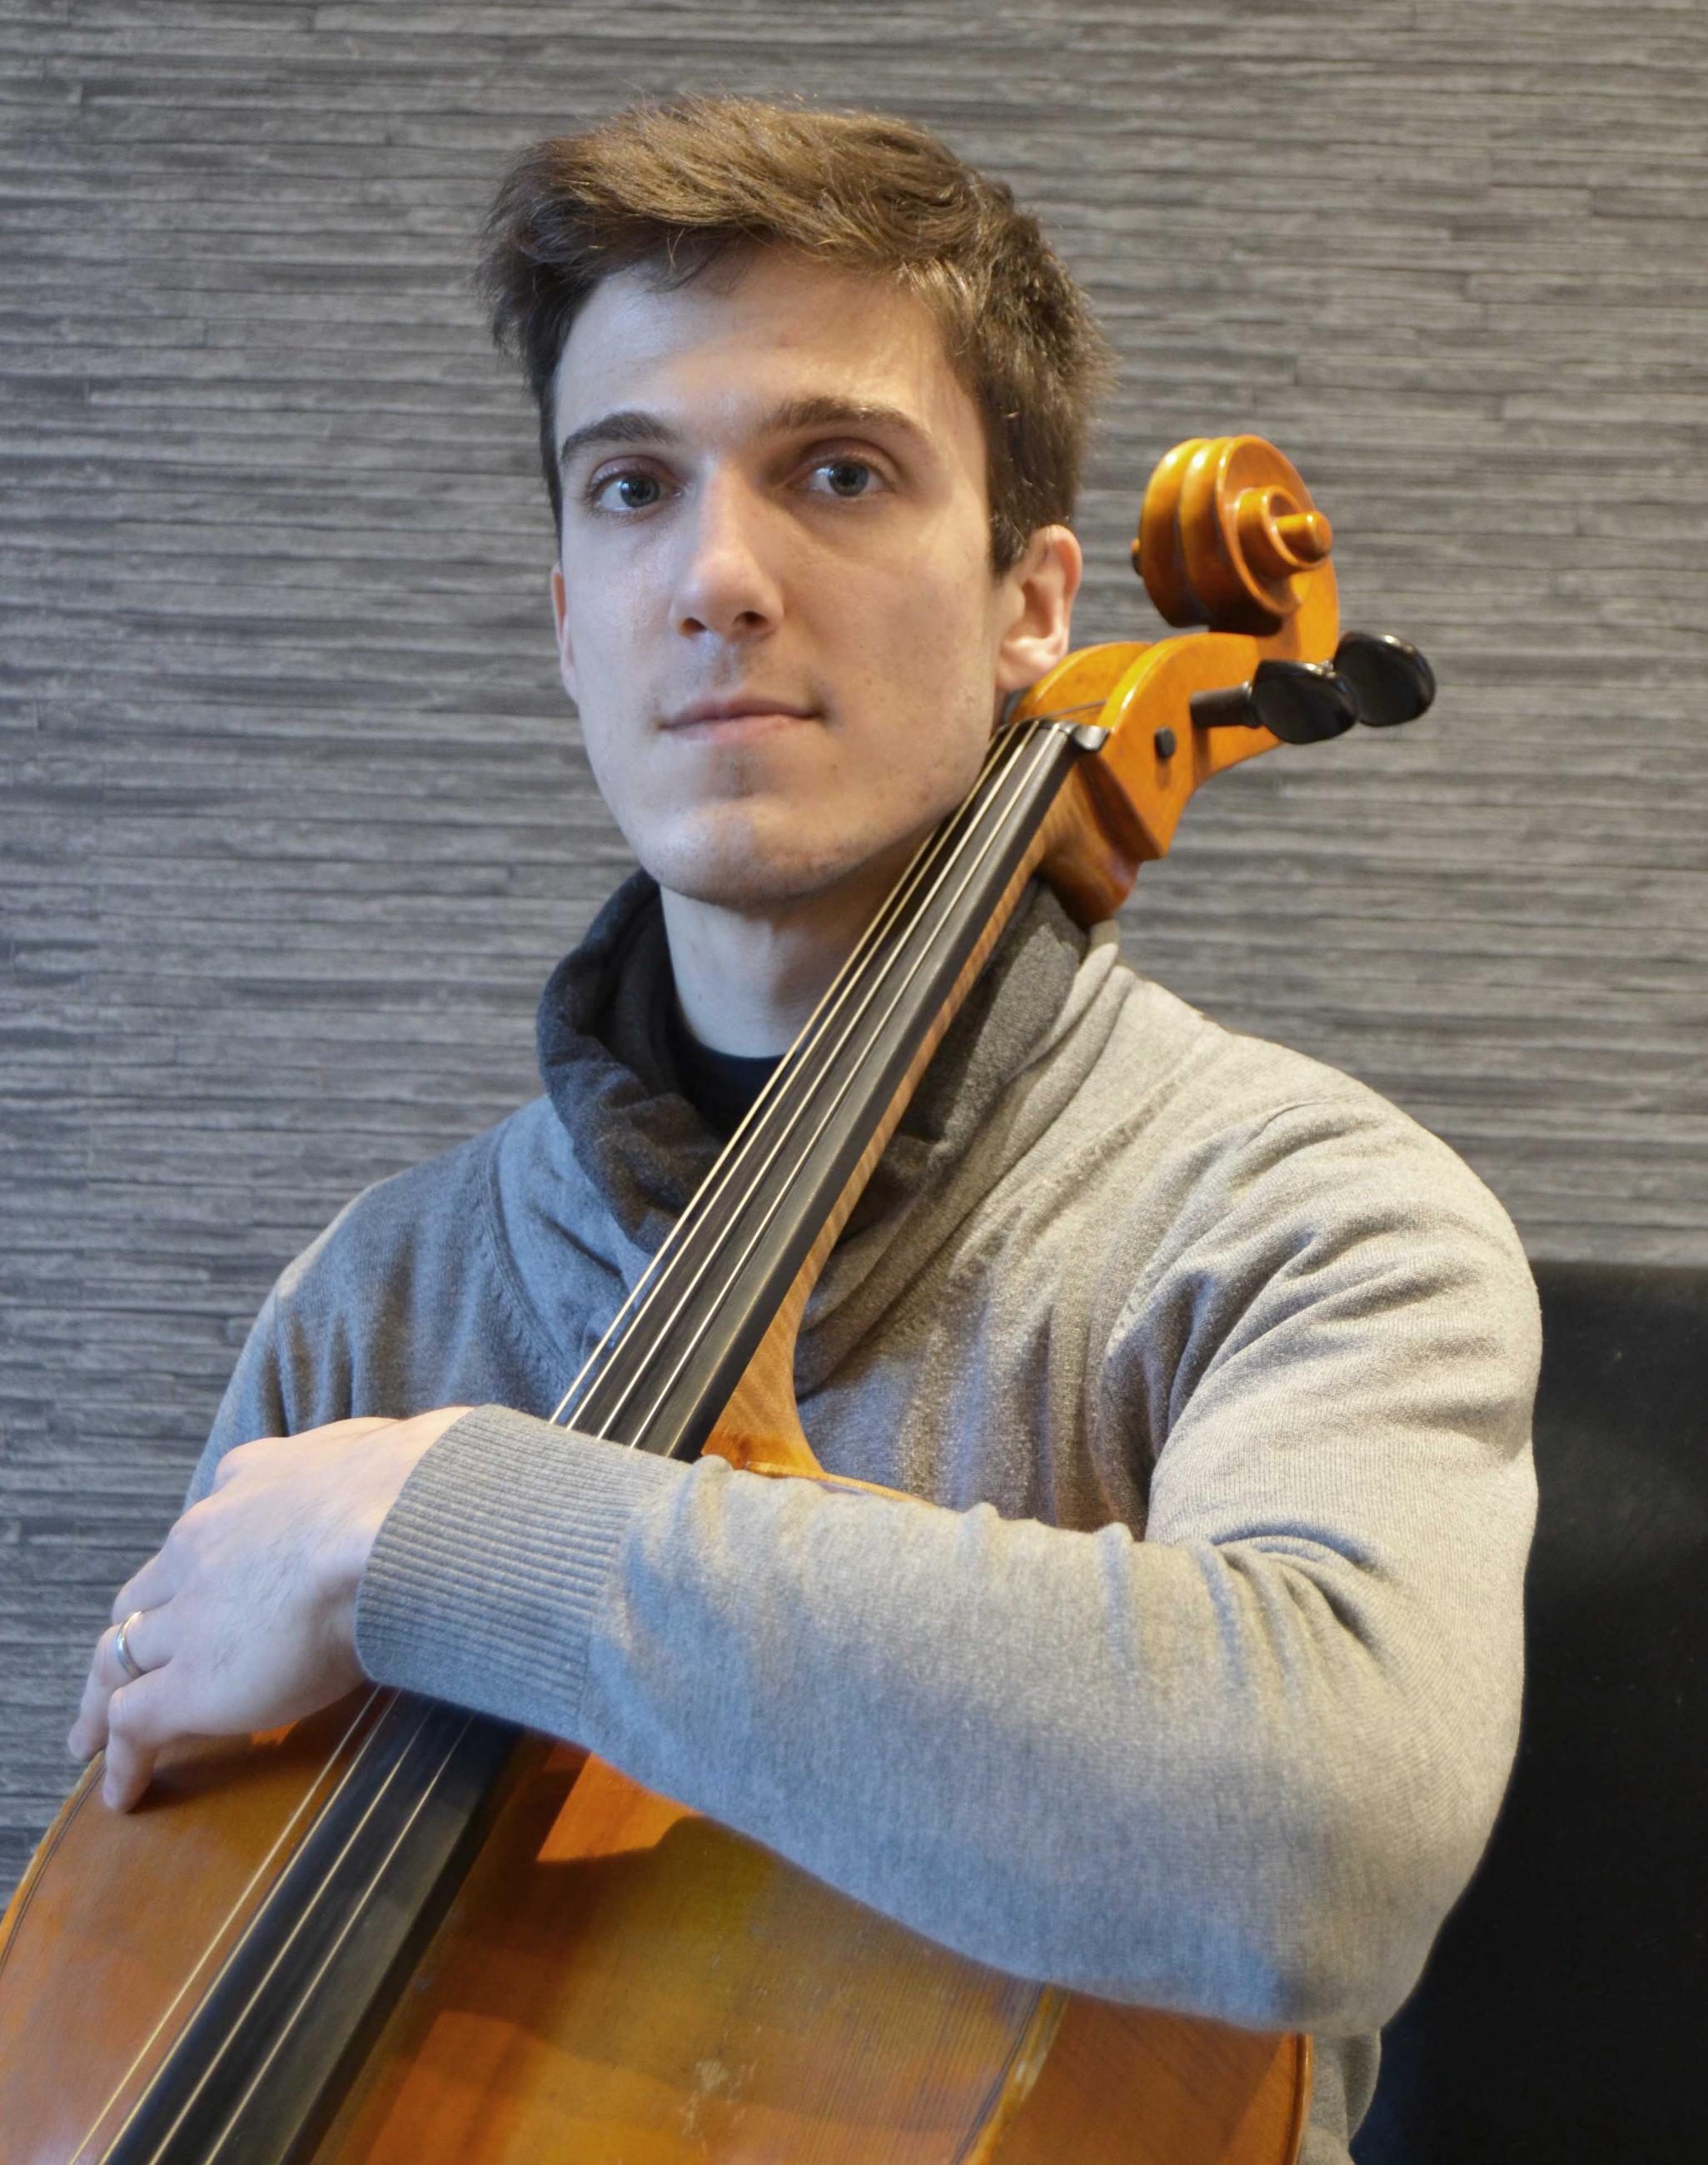 Thibault Lavrenov